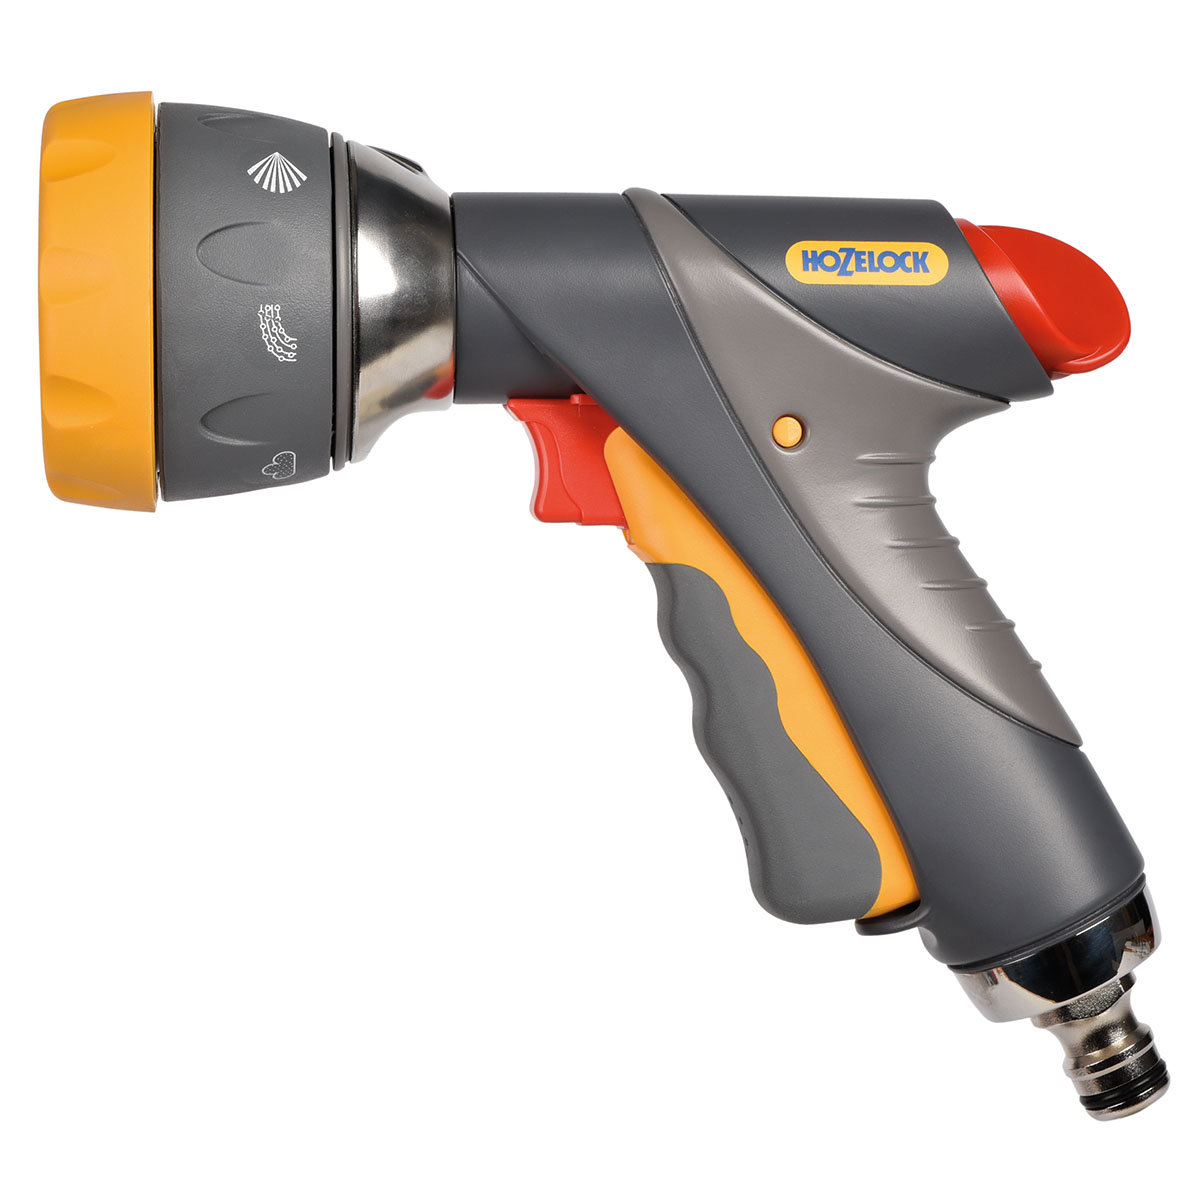 Wasserbrause Multi Spray Pro | #2